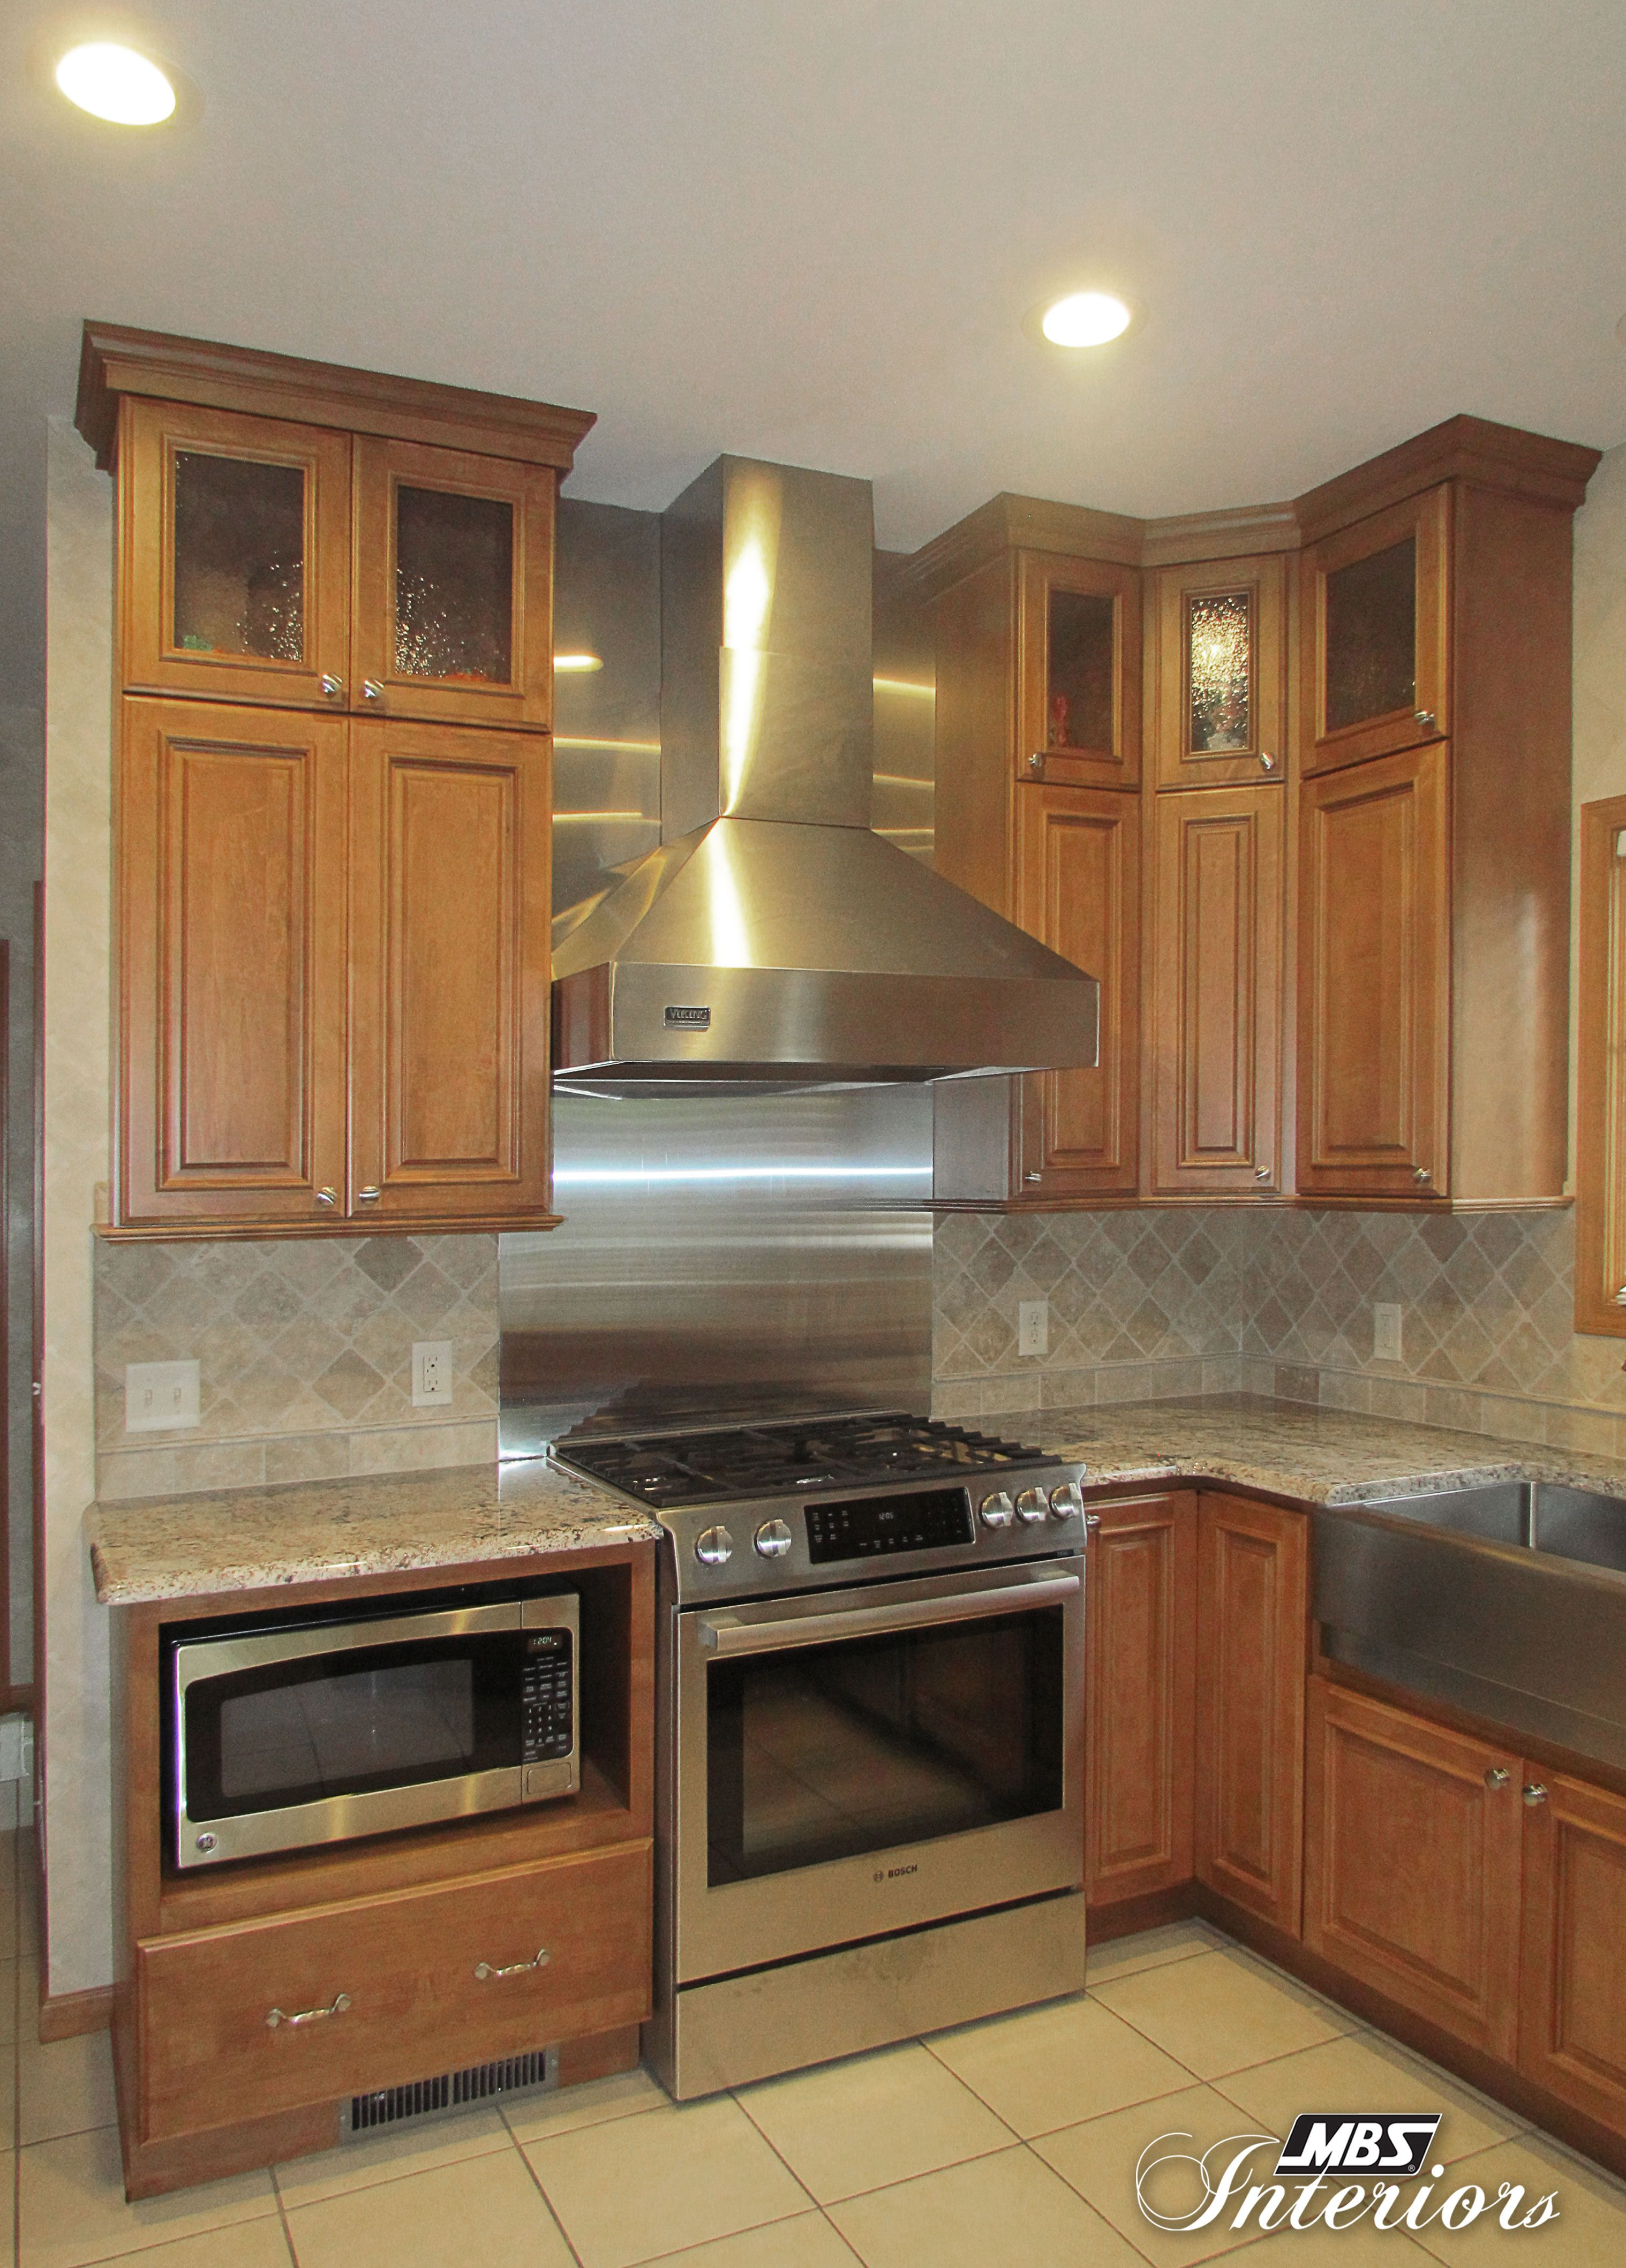 Pin On Mbs Interiors Kitchens